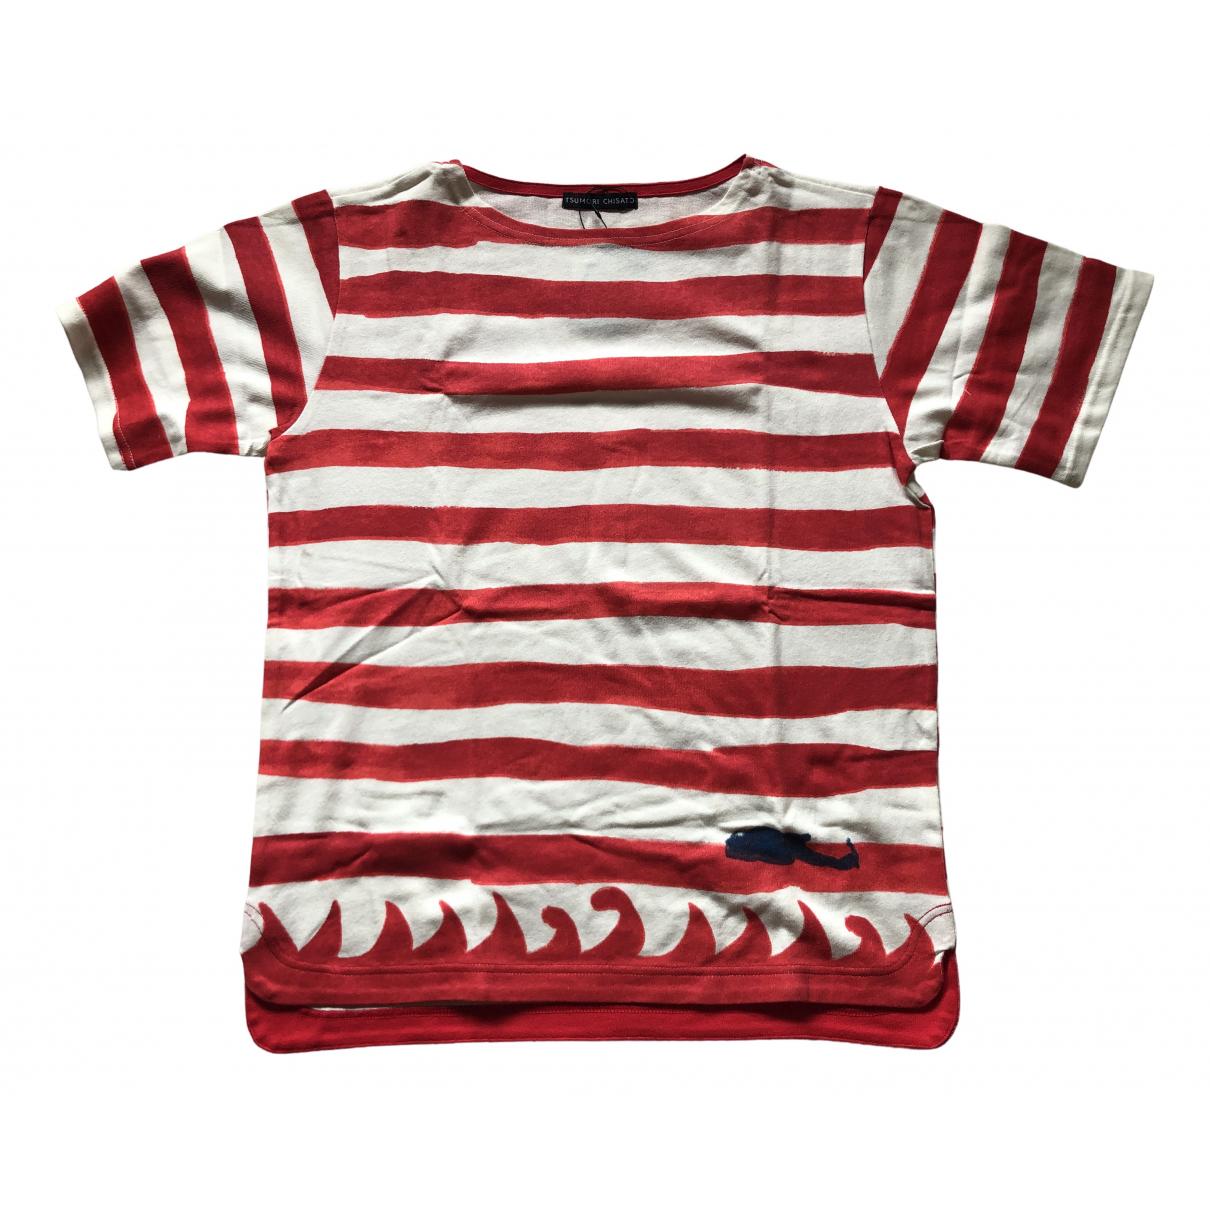 Tsumori Chisato - Tee shirts   pour homme en coton - rouge